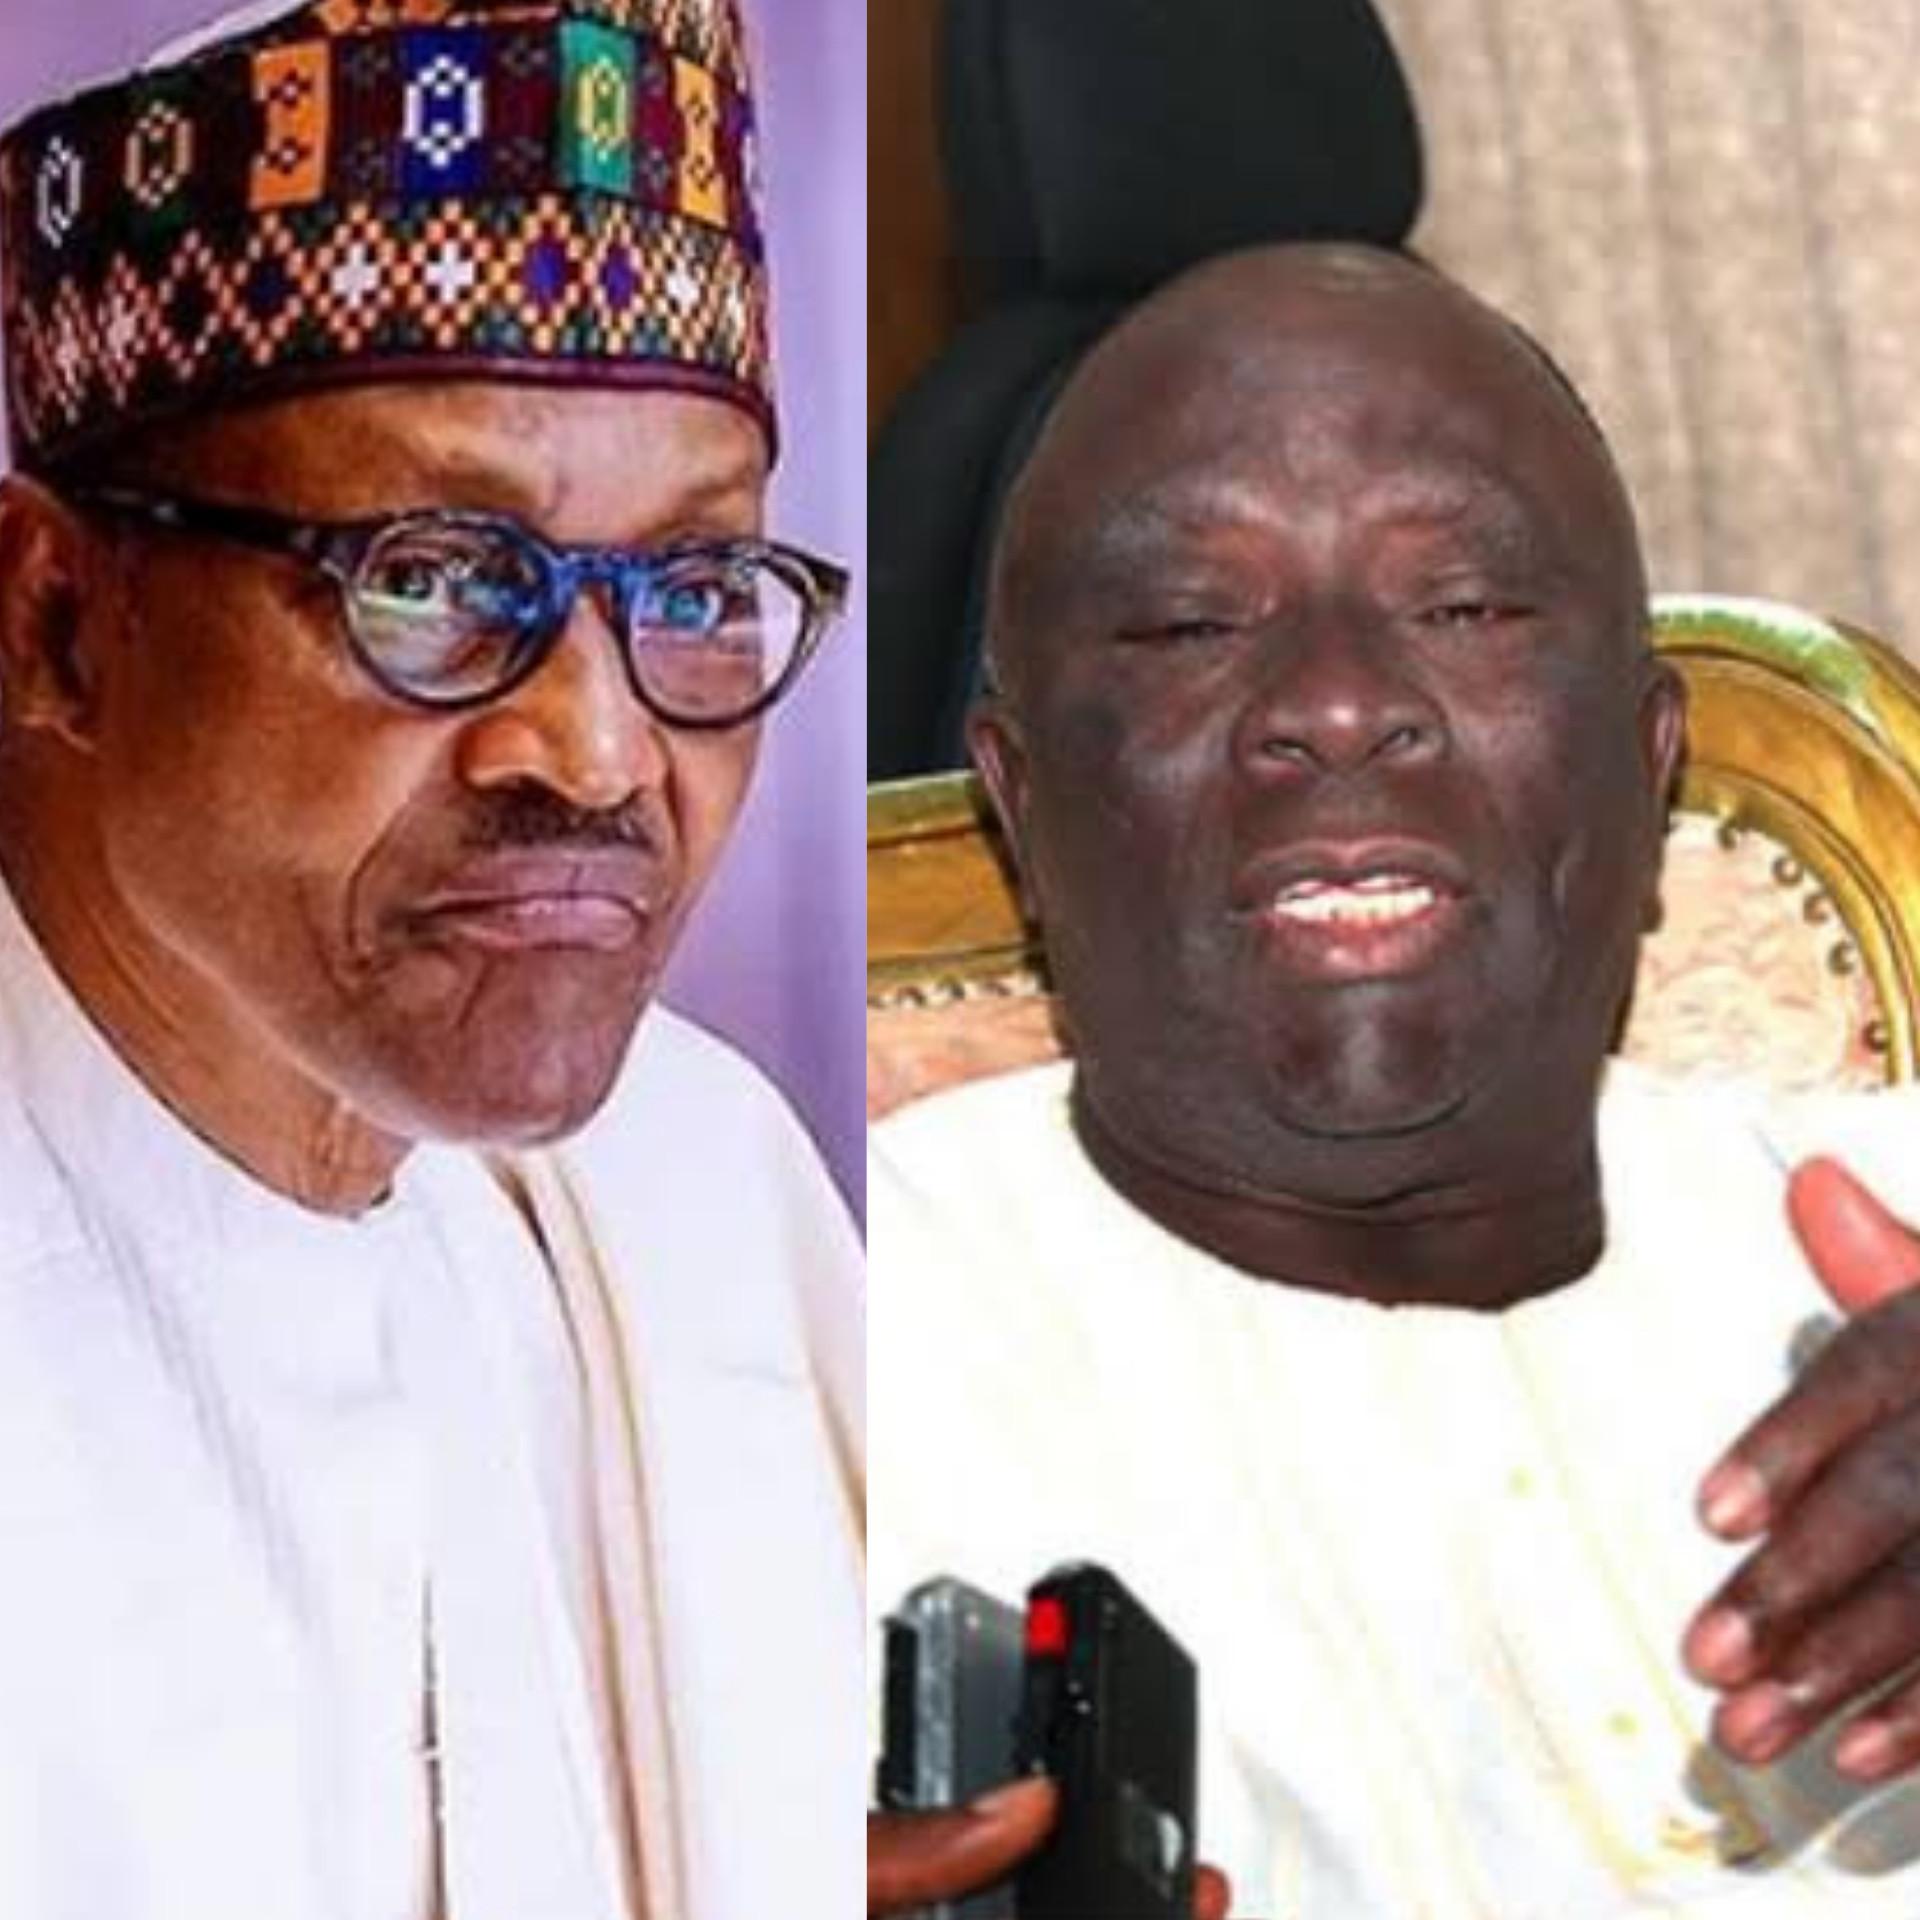 Buhari still in office because Nigerians are over-tolerant of despots - Afenifere leader Ayo Adebanjo